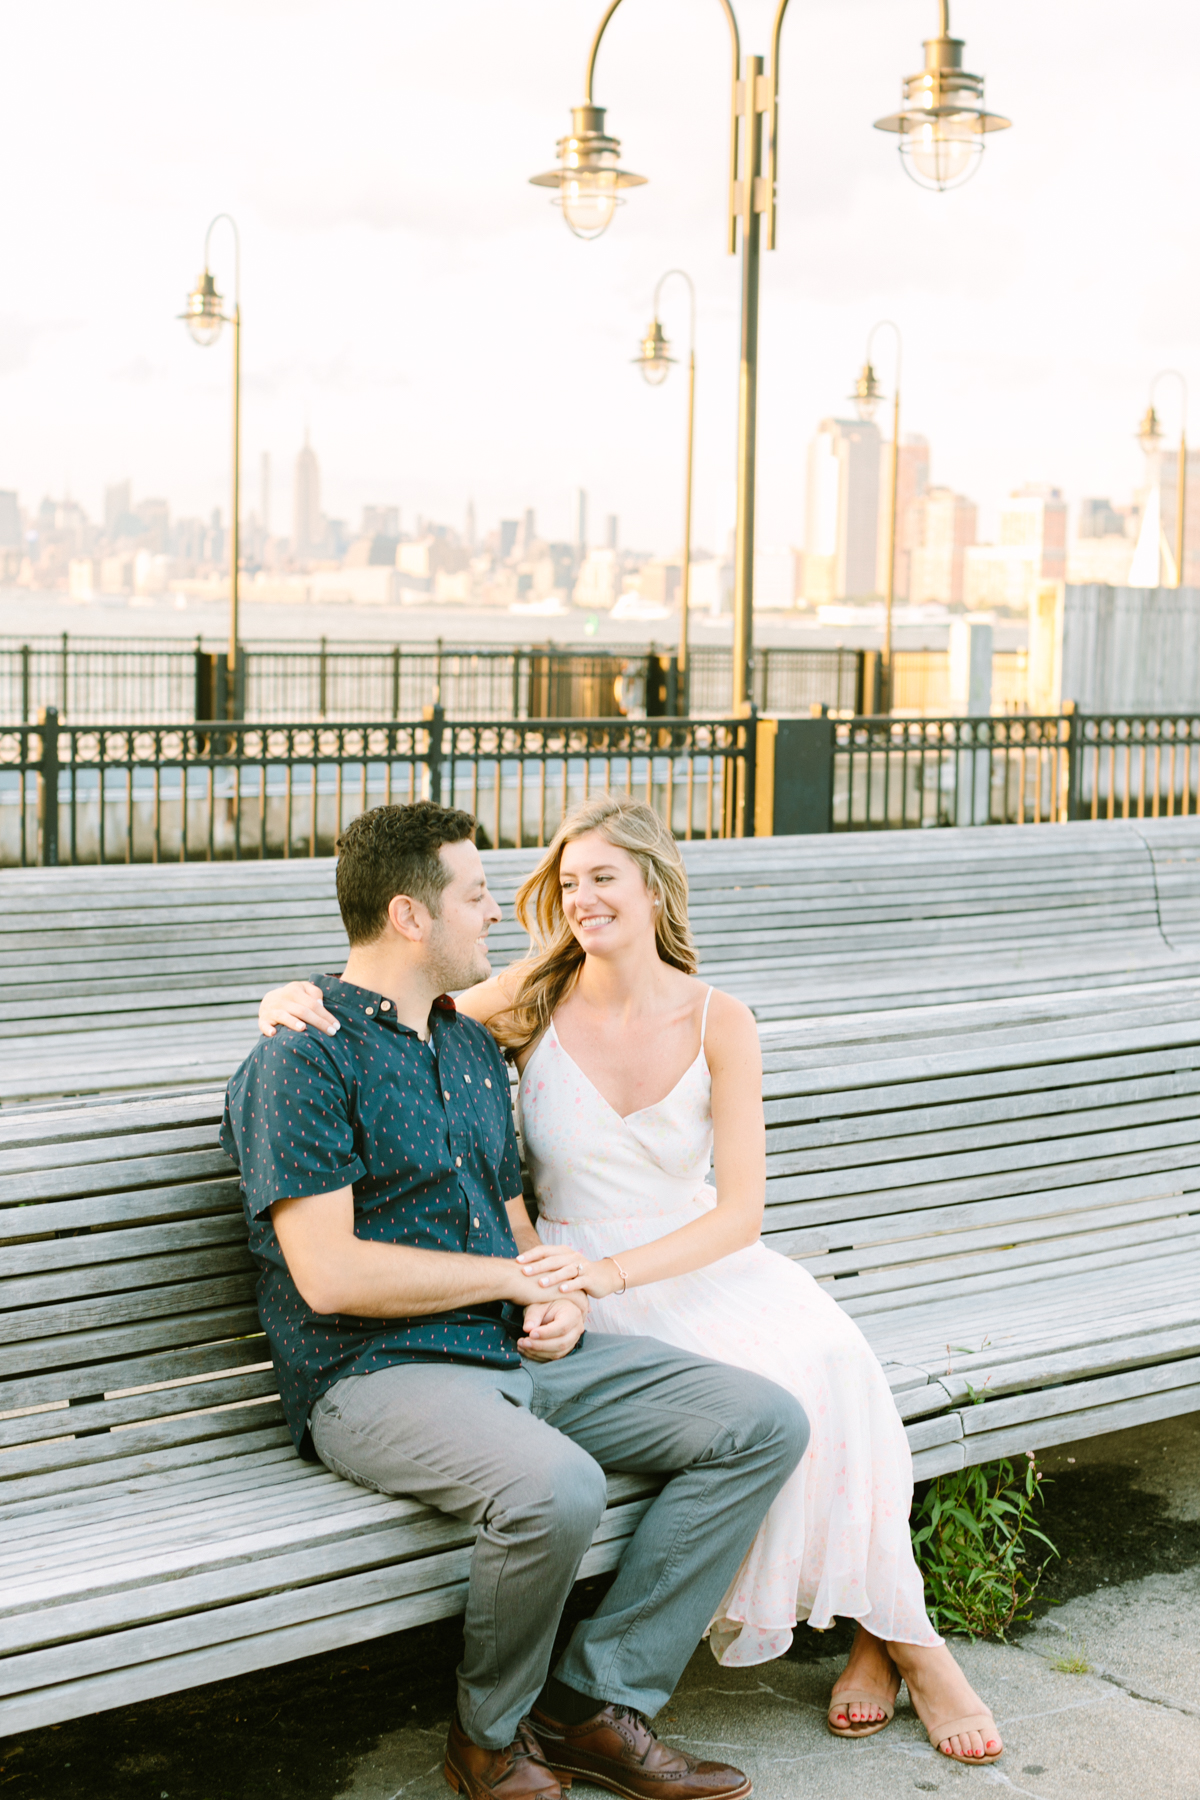 NYC-skyline-engagement-session-by-Tanya Isaeva-69.jpg